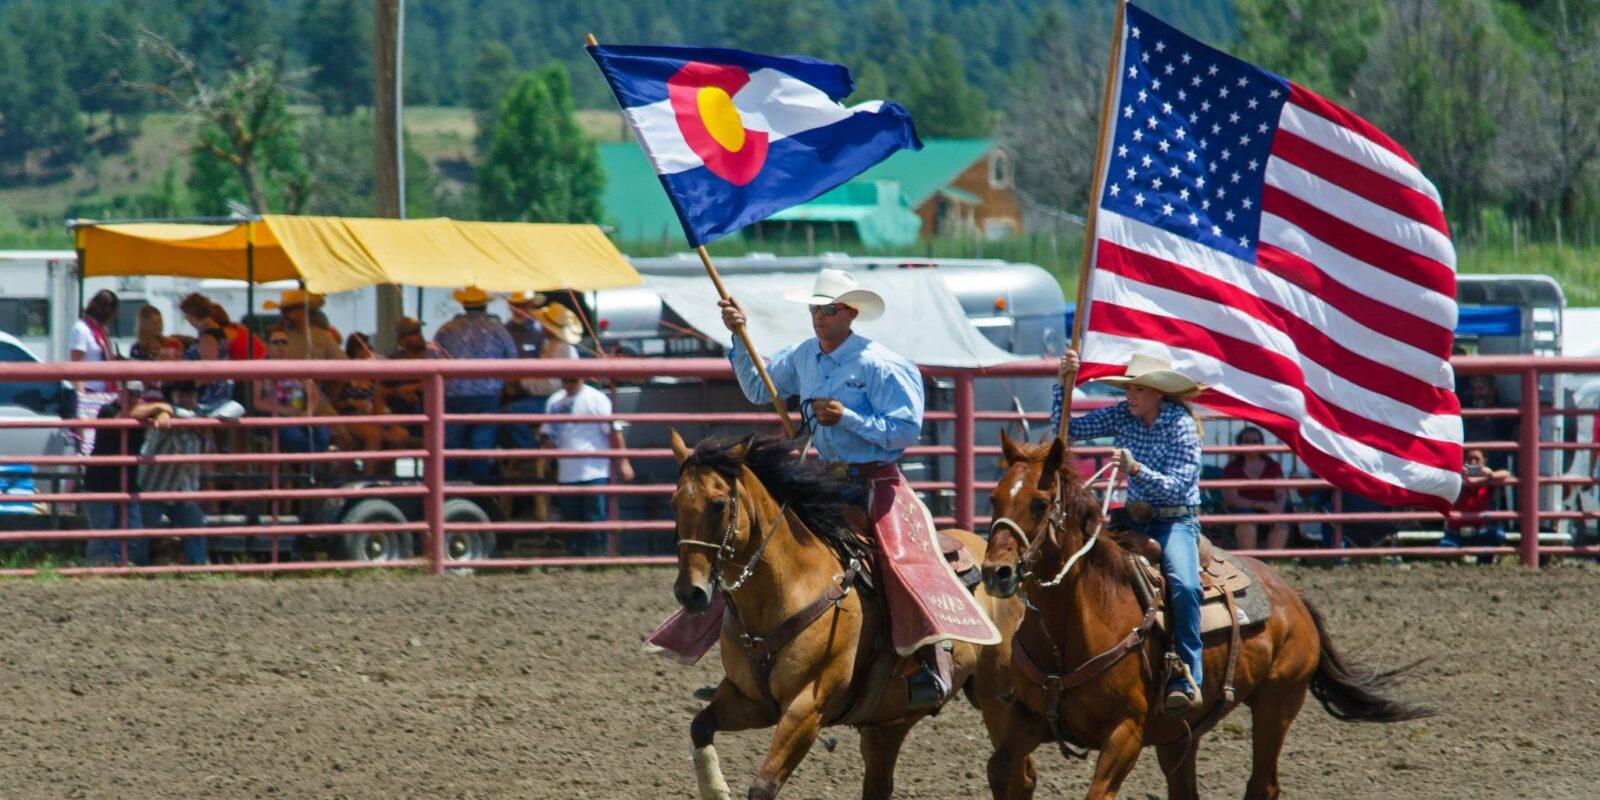 USA and Colorado Flags Pagosa Springs Rodeo